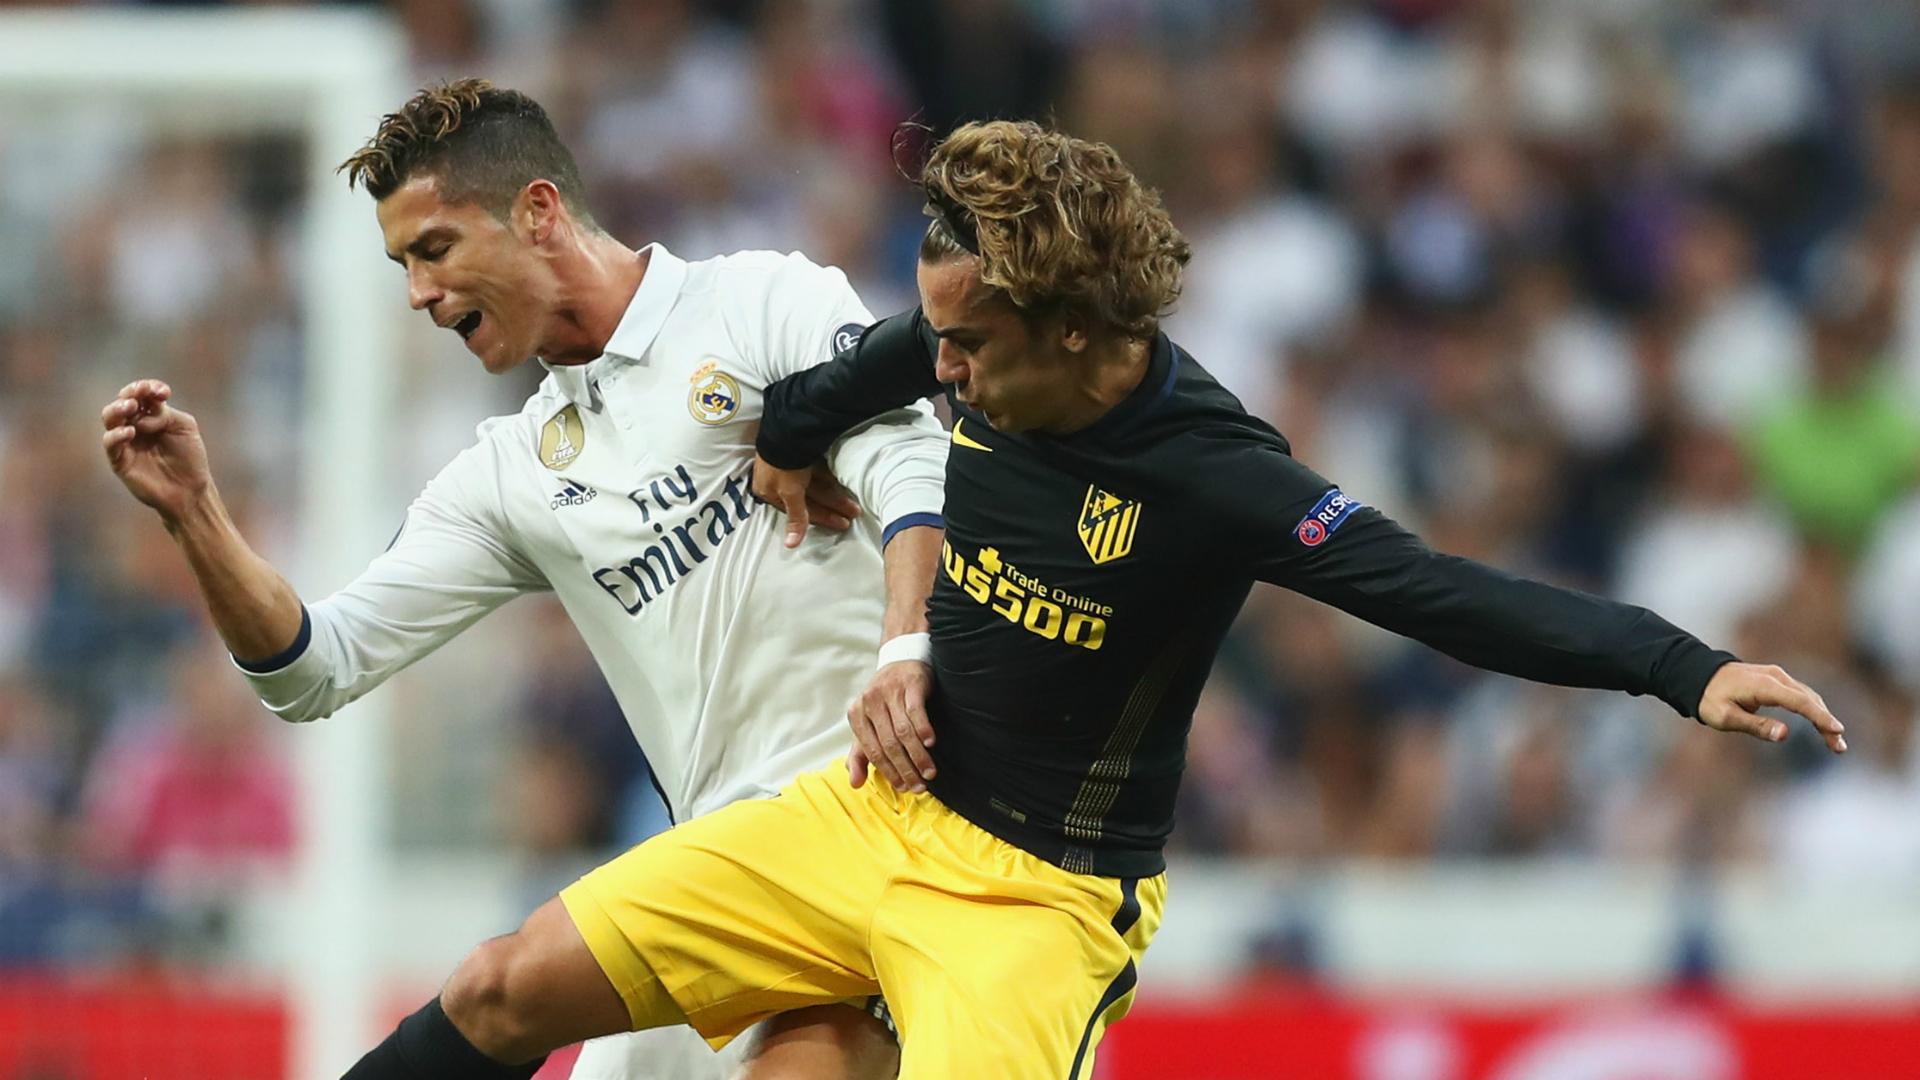 Cristiano Ronaldo Antoine Griezmann Real Madrid Atletico Madrid Champions League